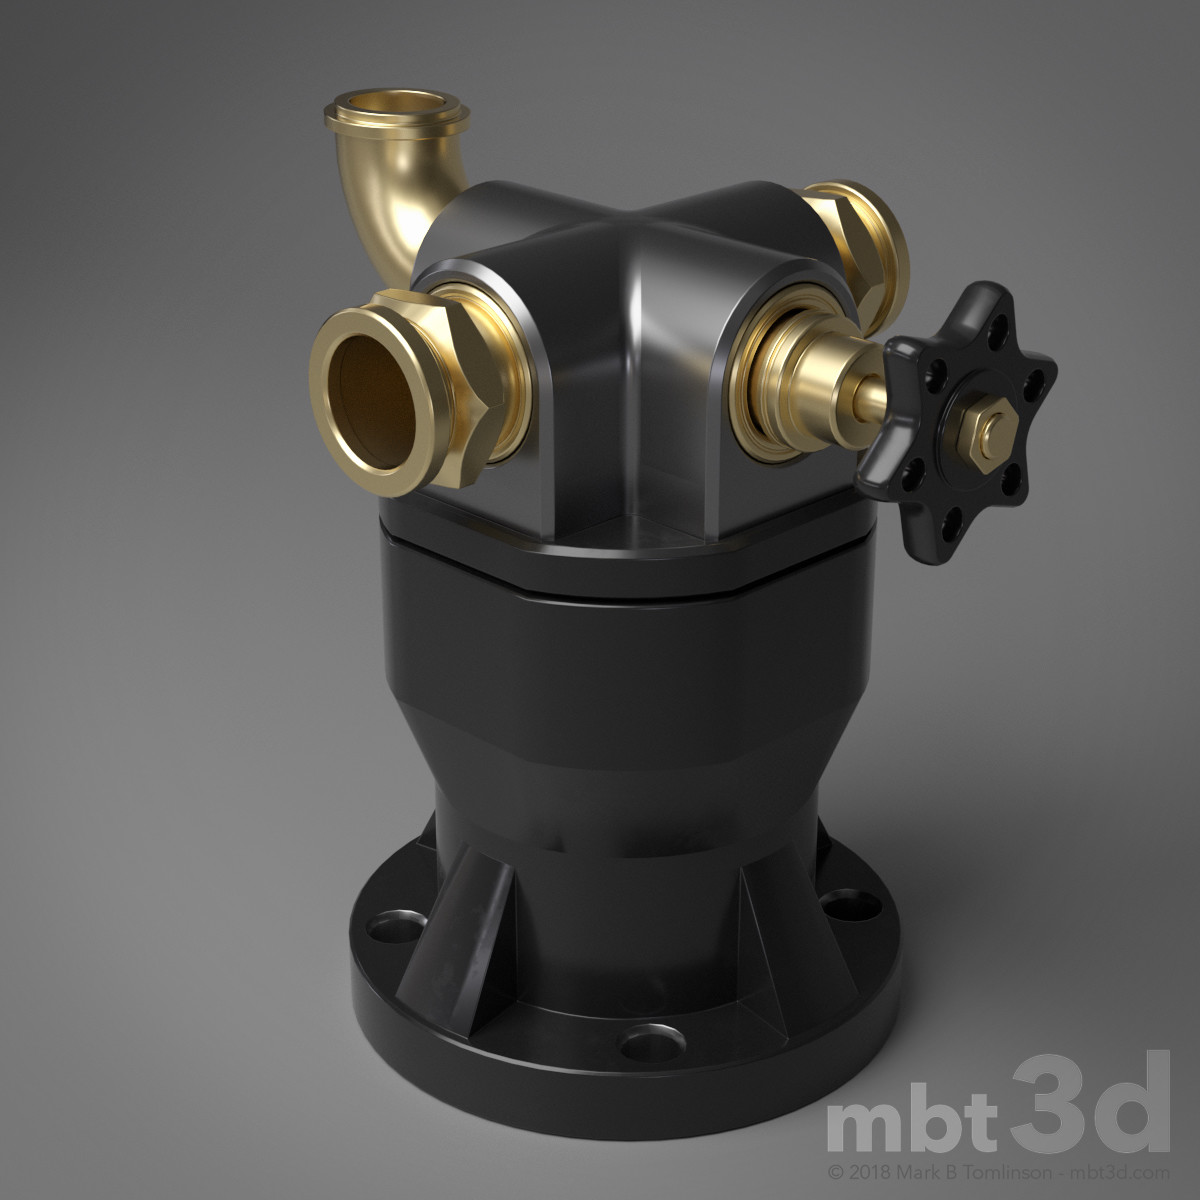 Box XVII: Hard surface model valve handle intake